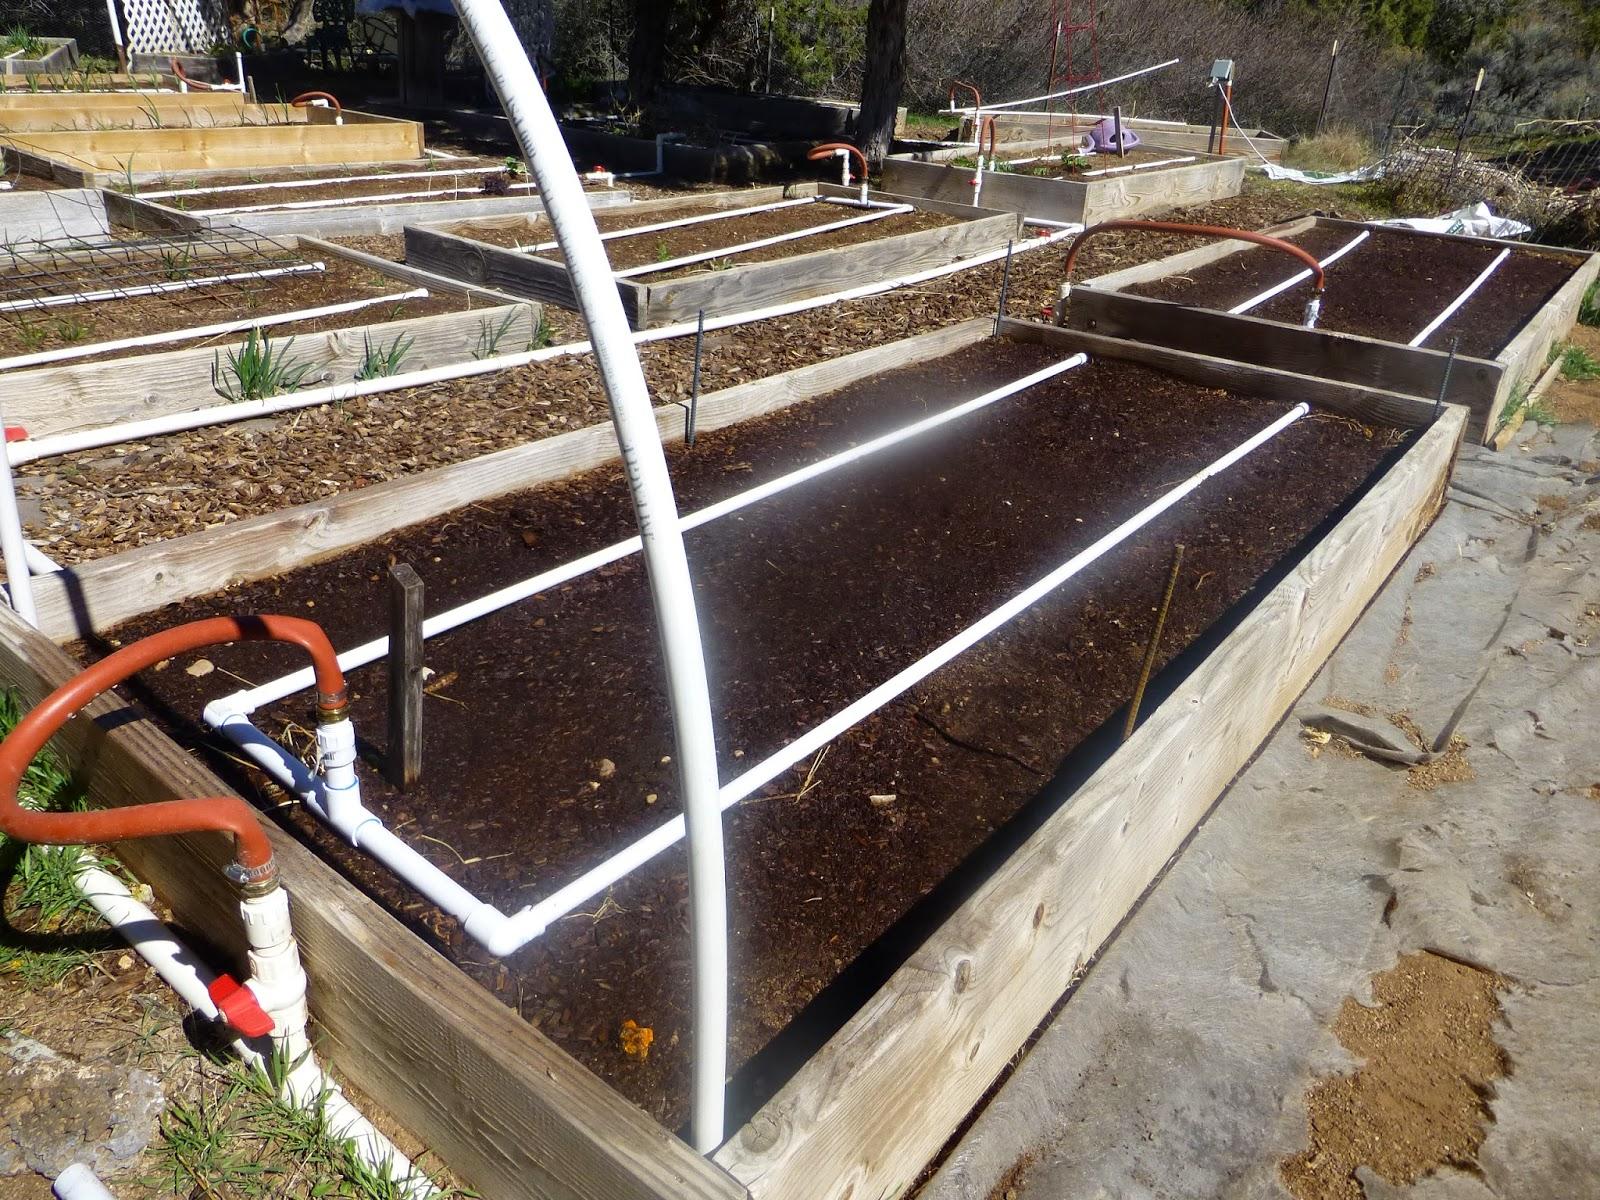 Growing Organic Choosing A Site Building Raised Beds